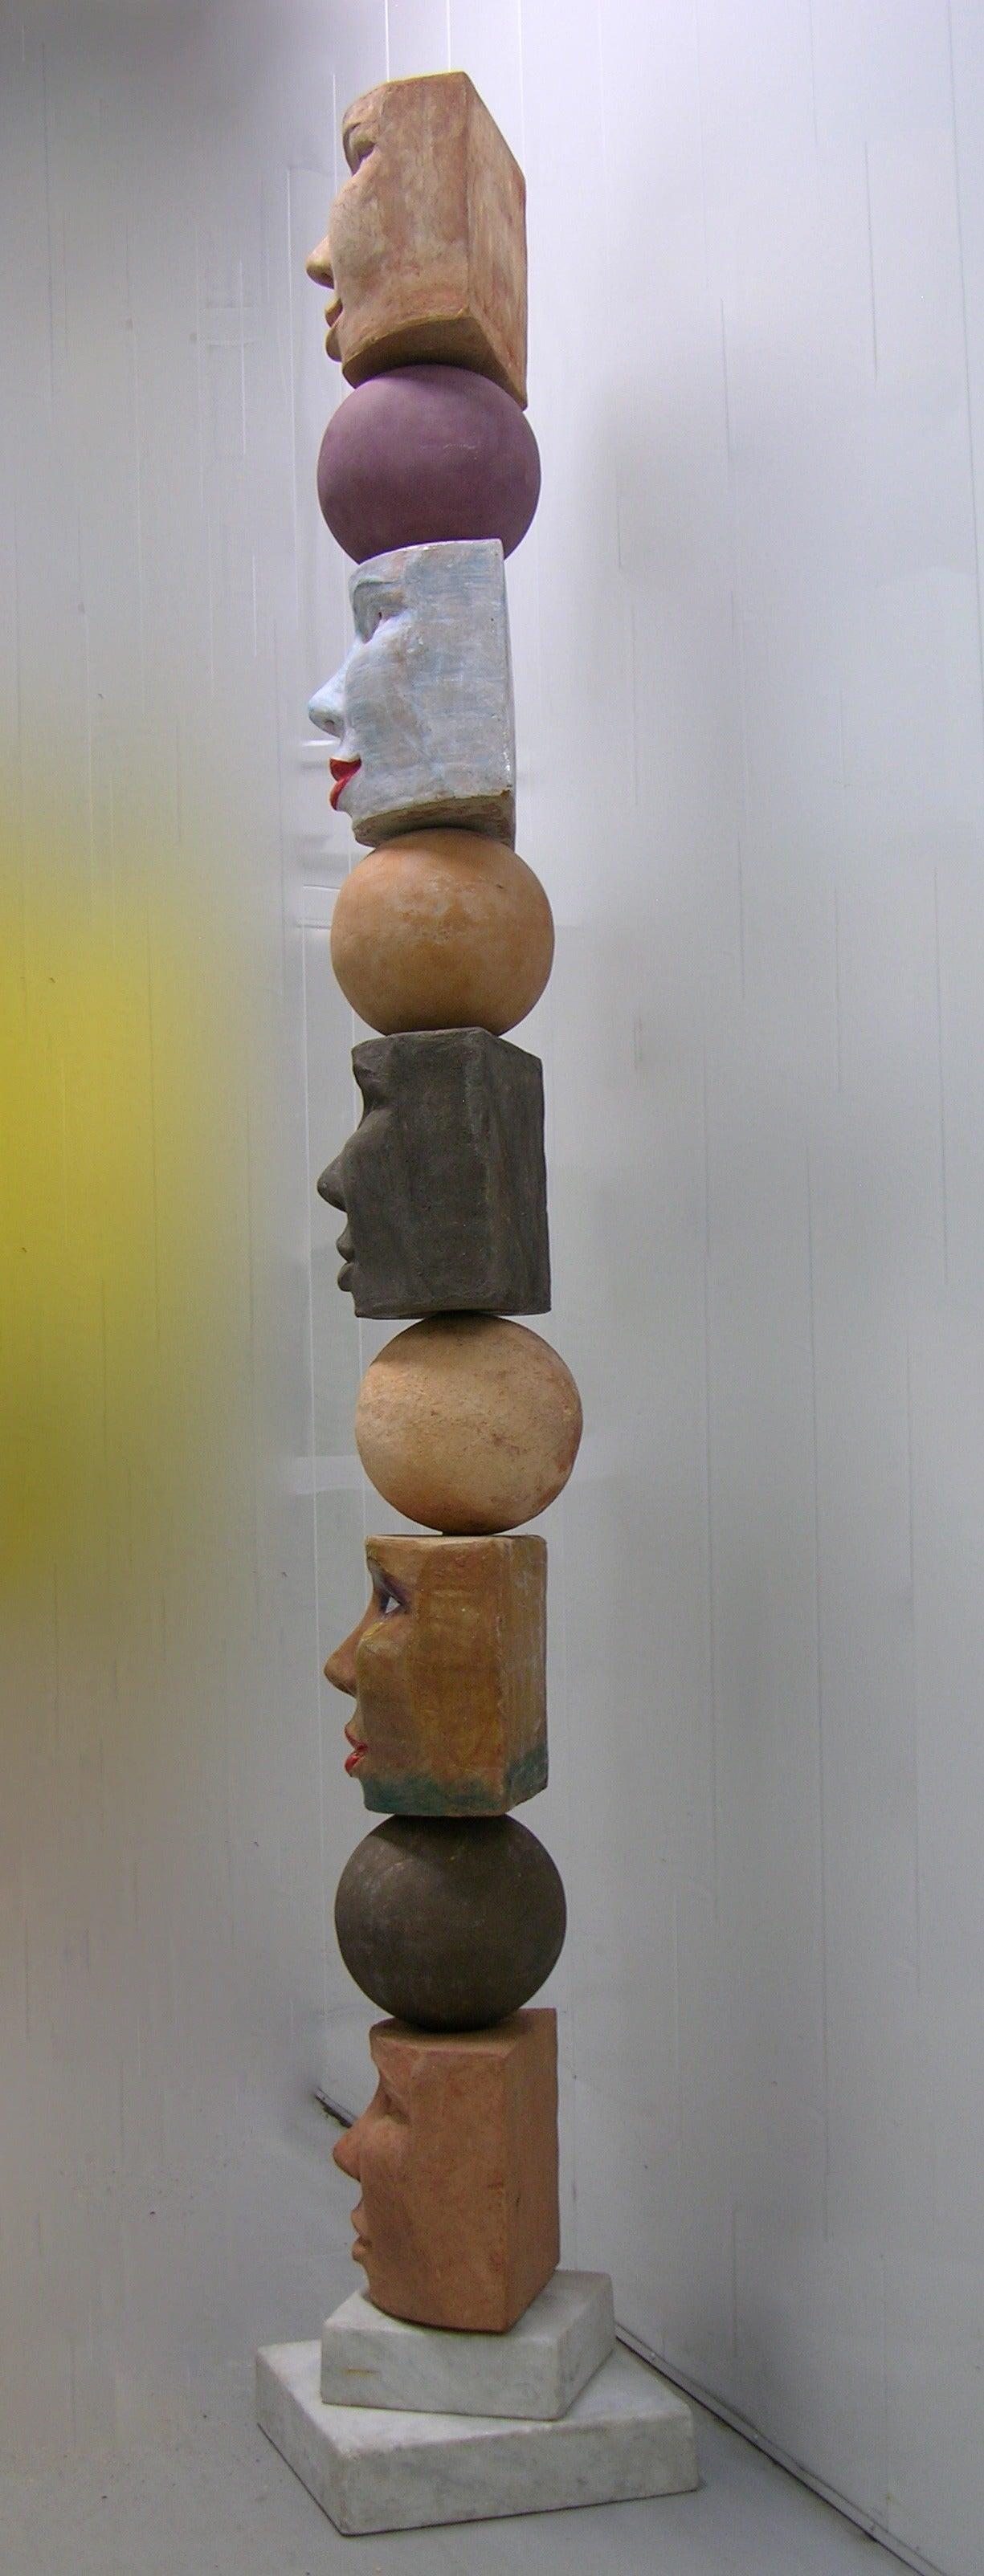 TOTEM Contemporary Italian Organic Pastel Enamel Figural Sculpture in Terracotta For Sale 1